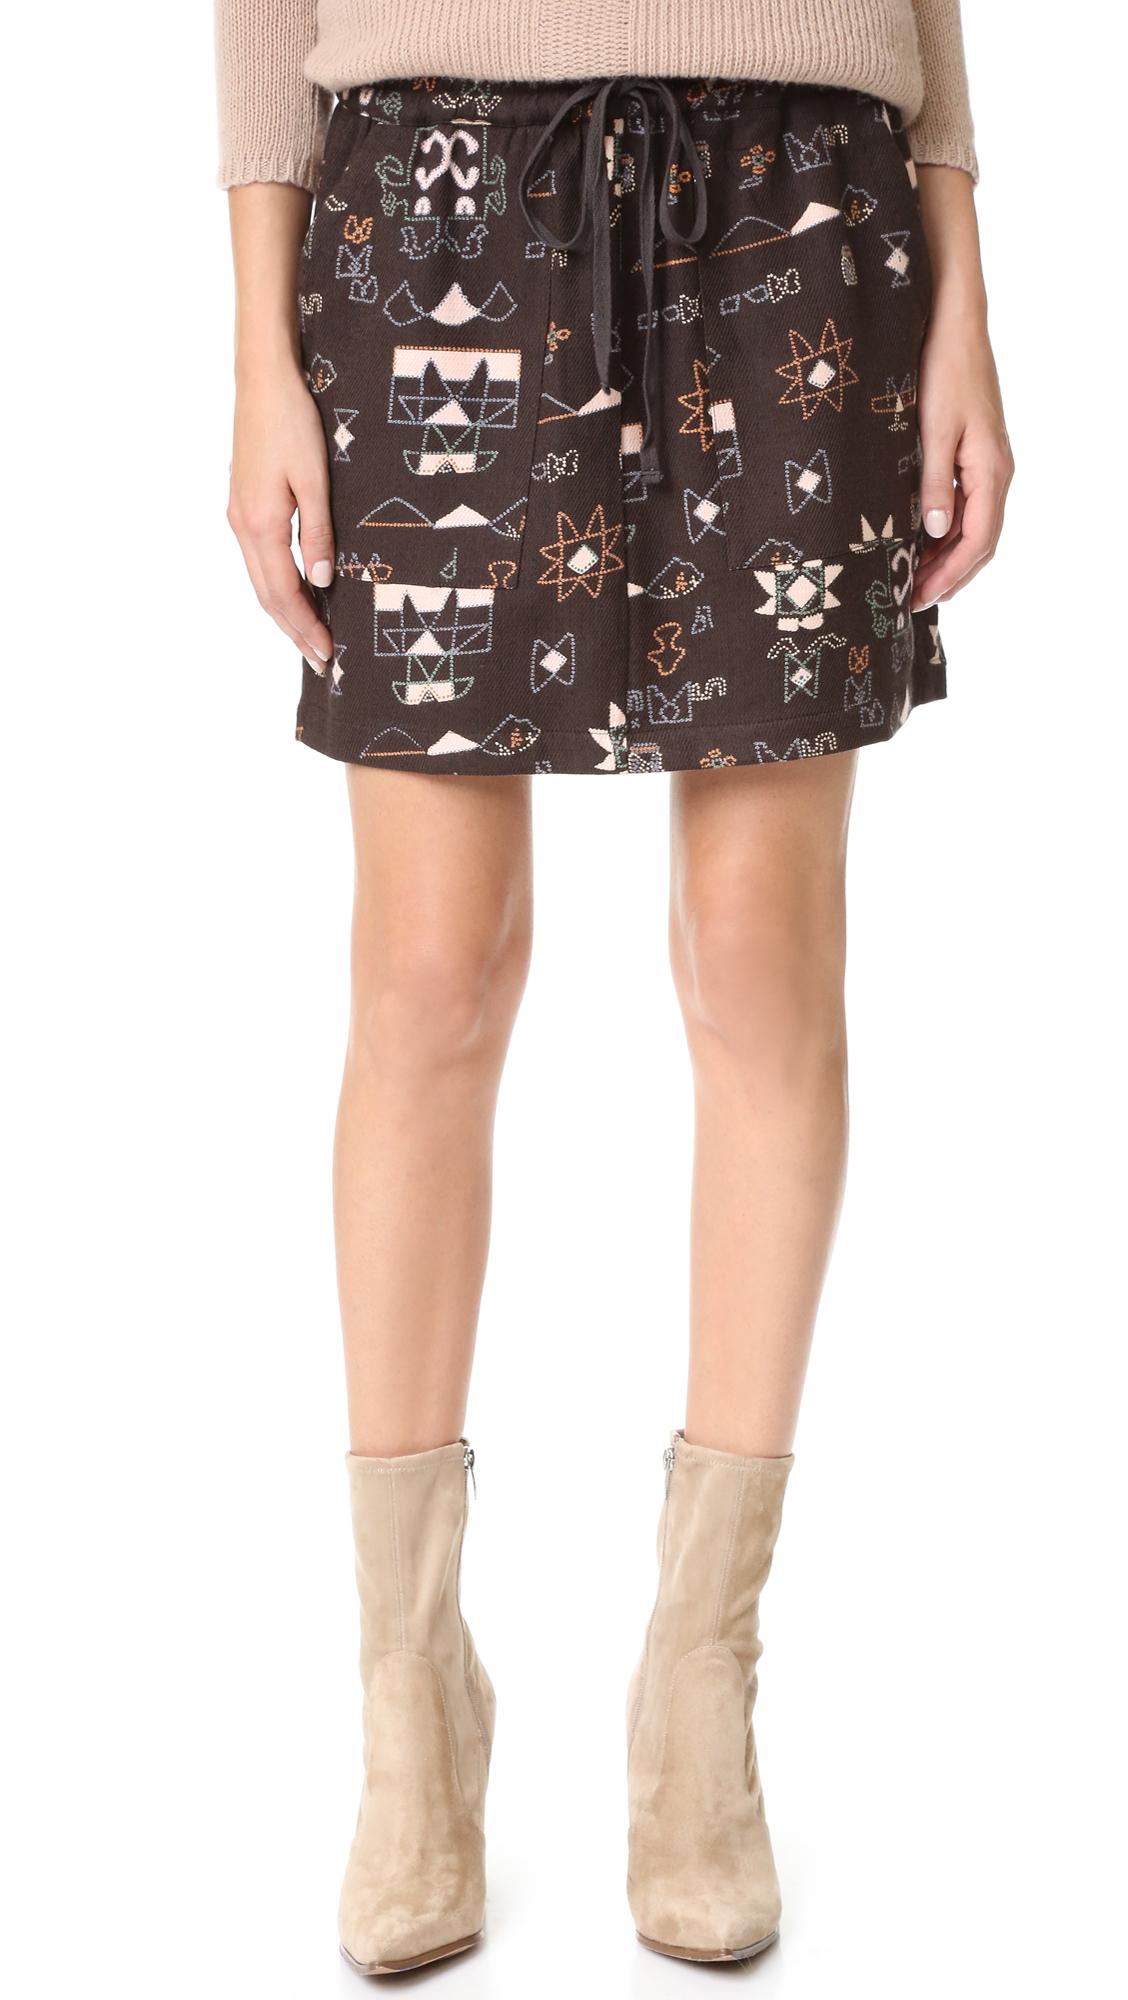 Antik Batik Chain Skirt - Faded Black at Shopbop